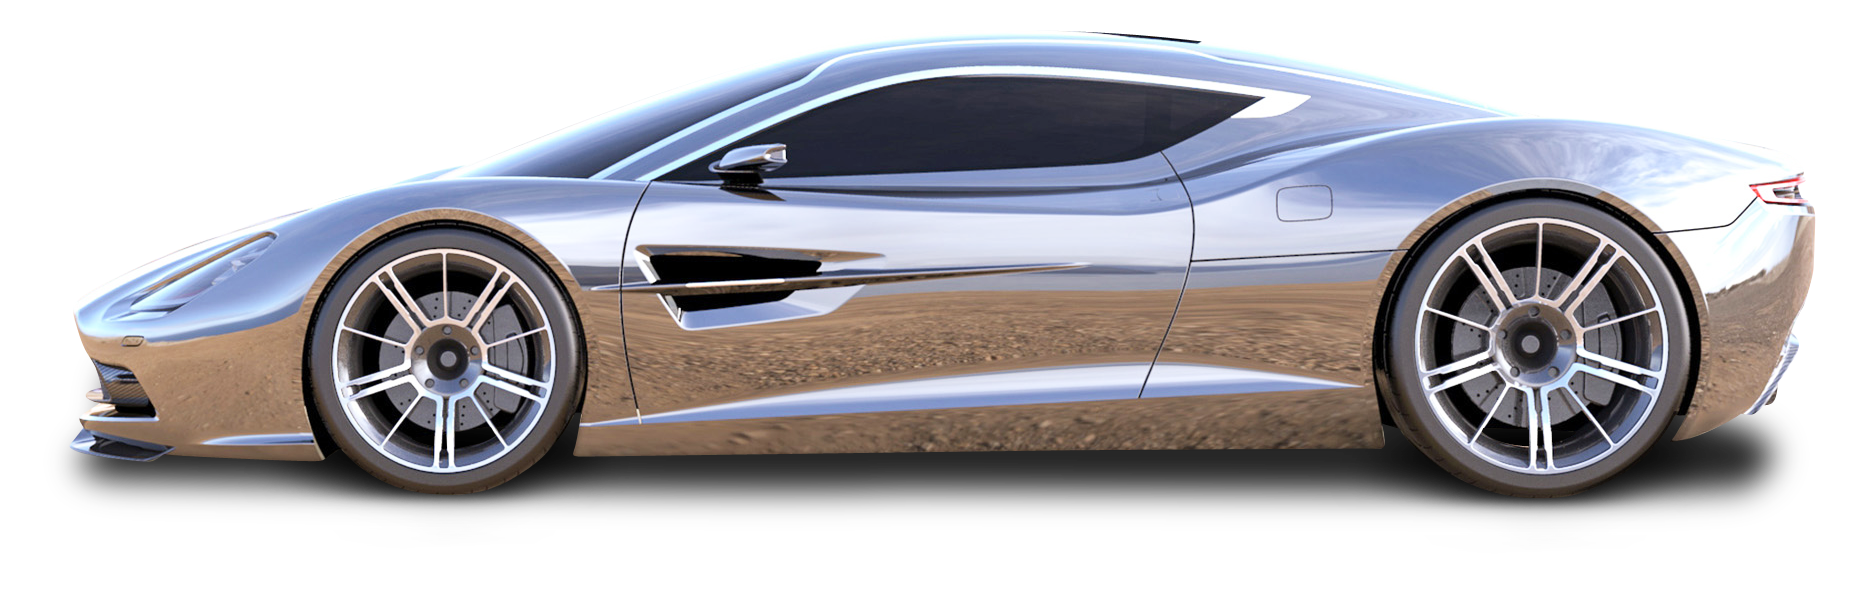 Future car clipart vector free Concept Car PNG Transparent Images | PNG All vector free